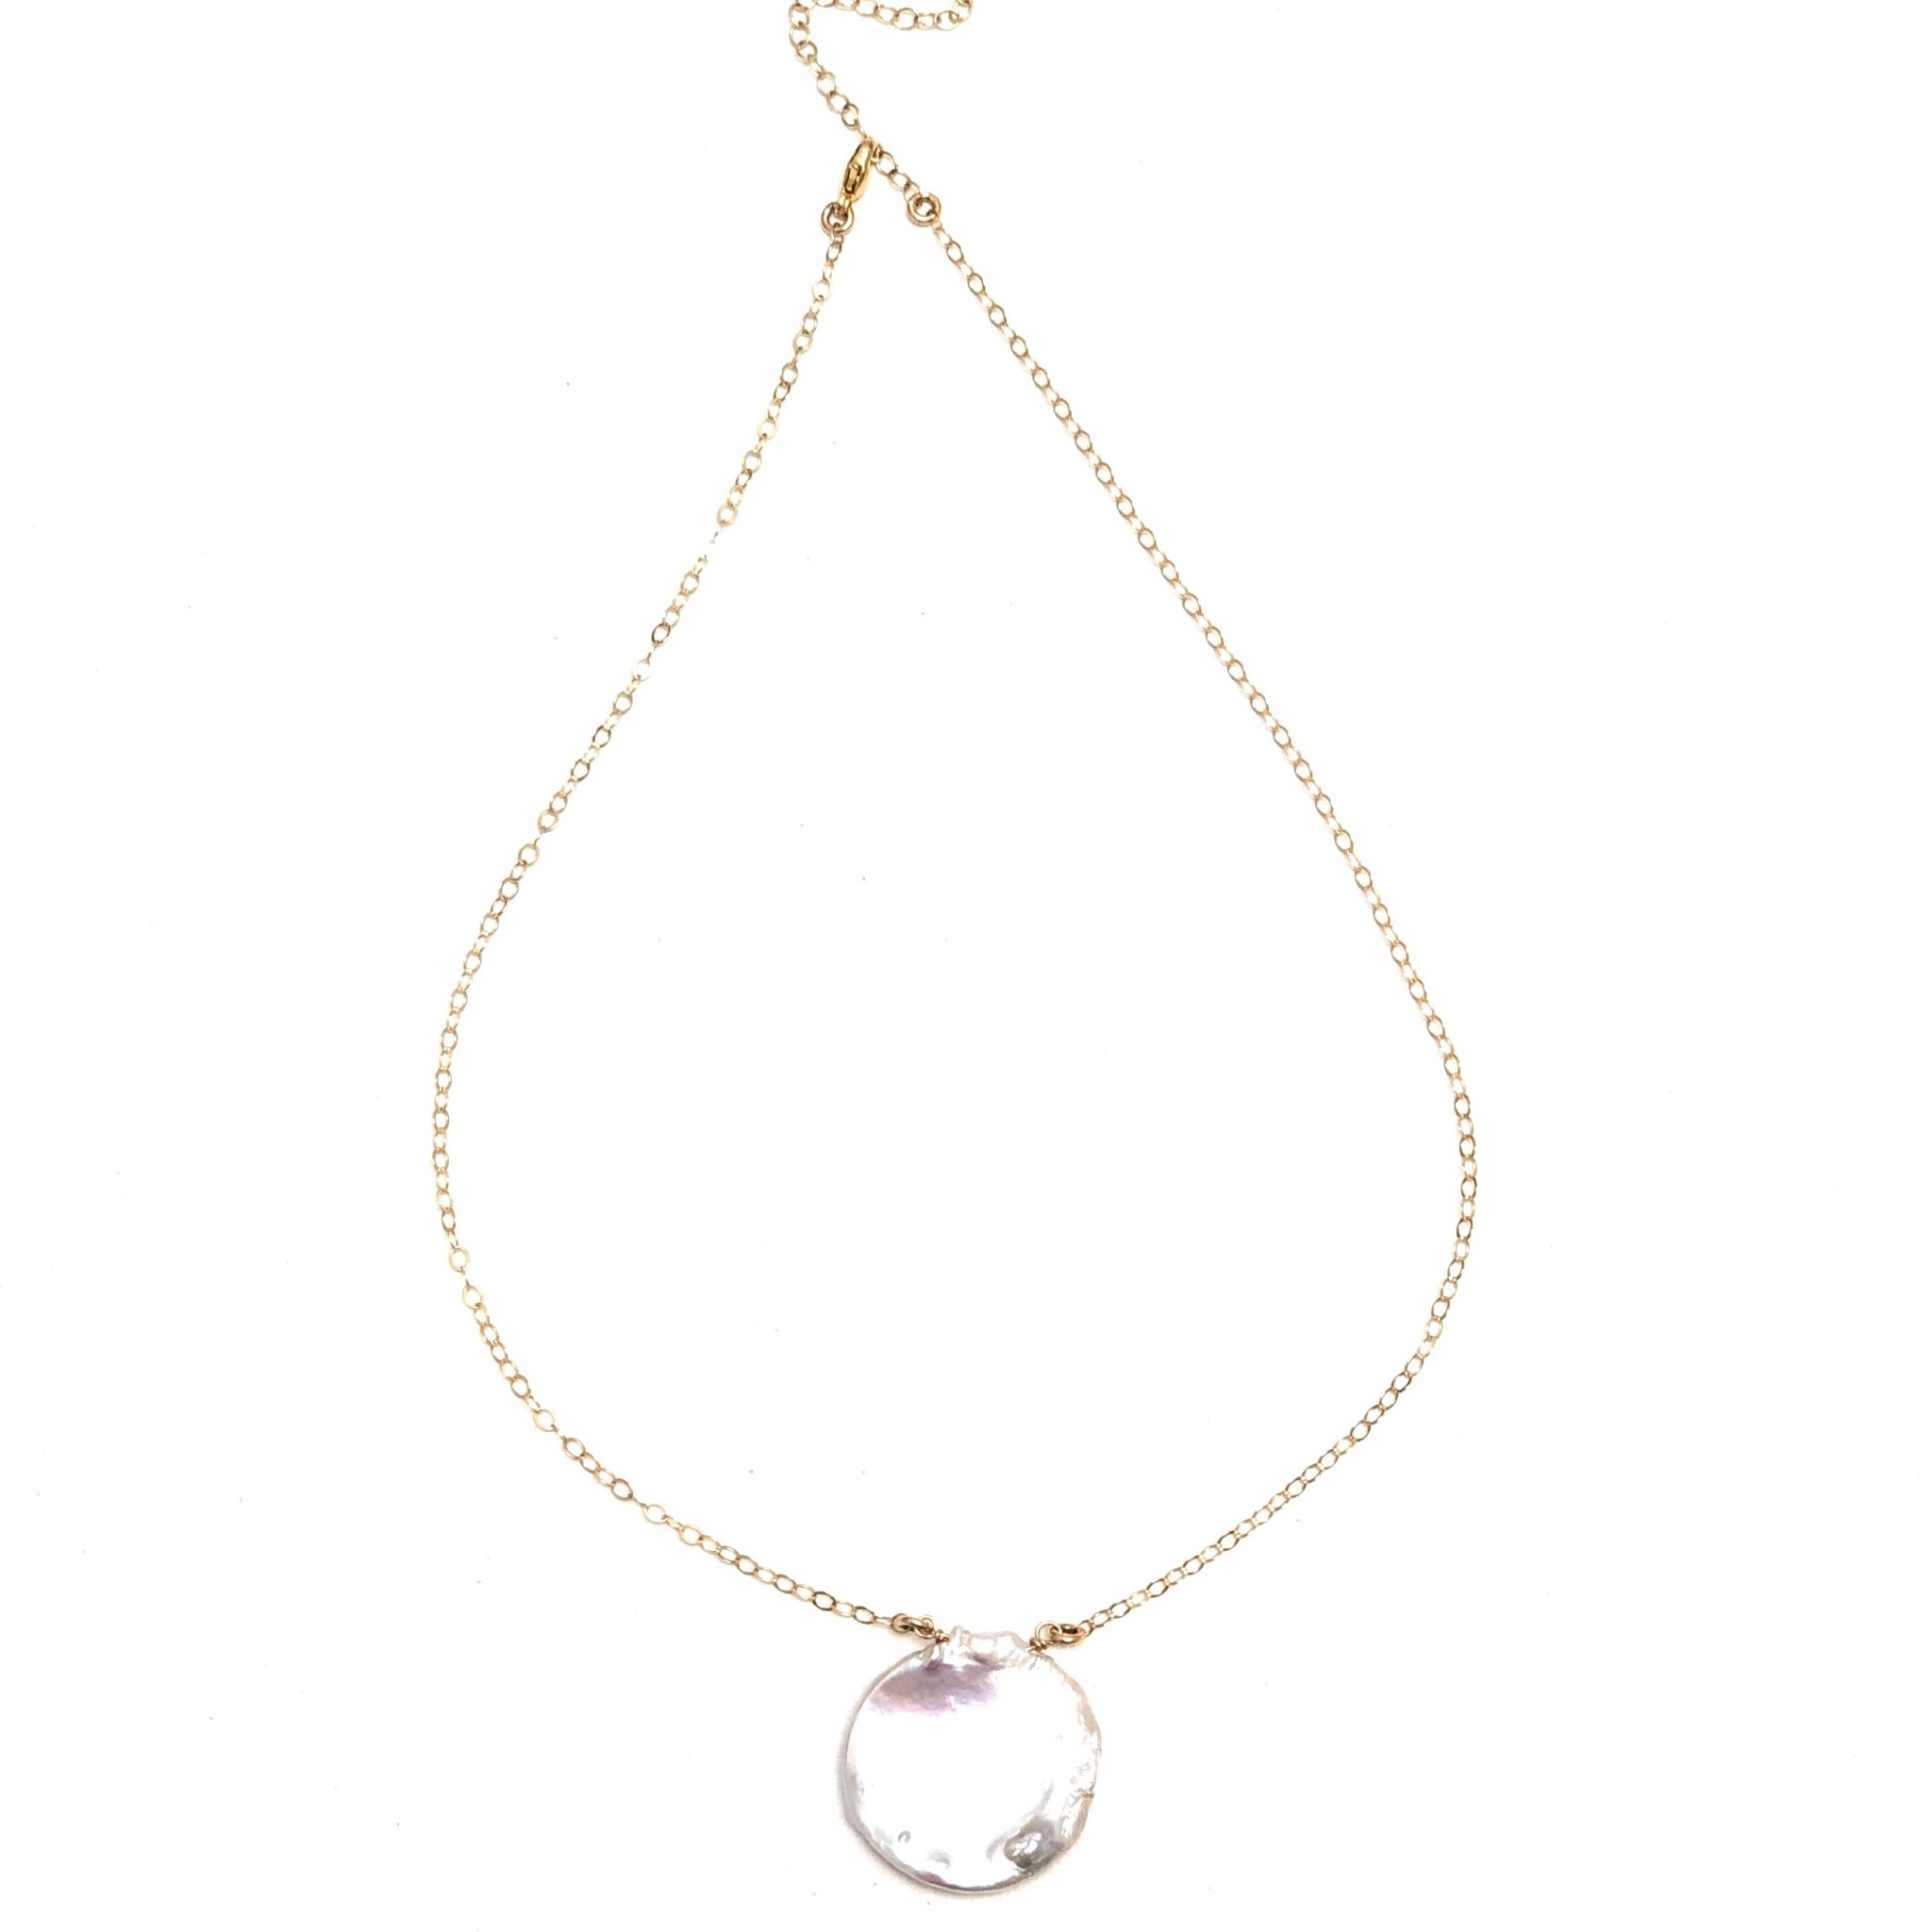 Round Keshi Petal Pearl on GF Chain